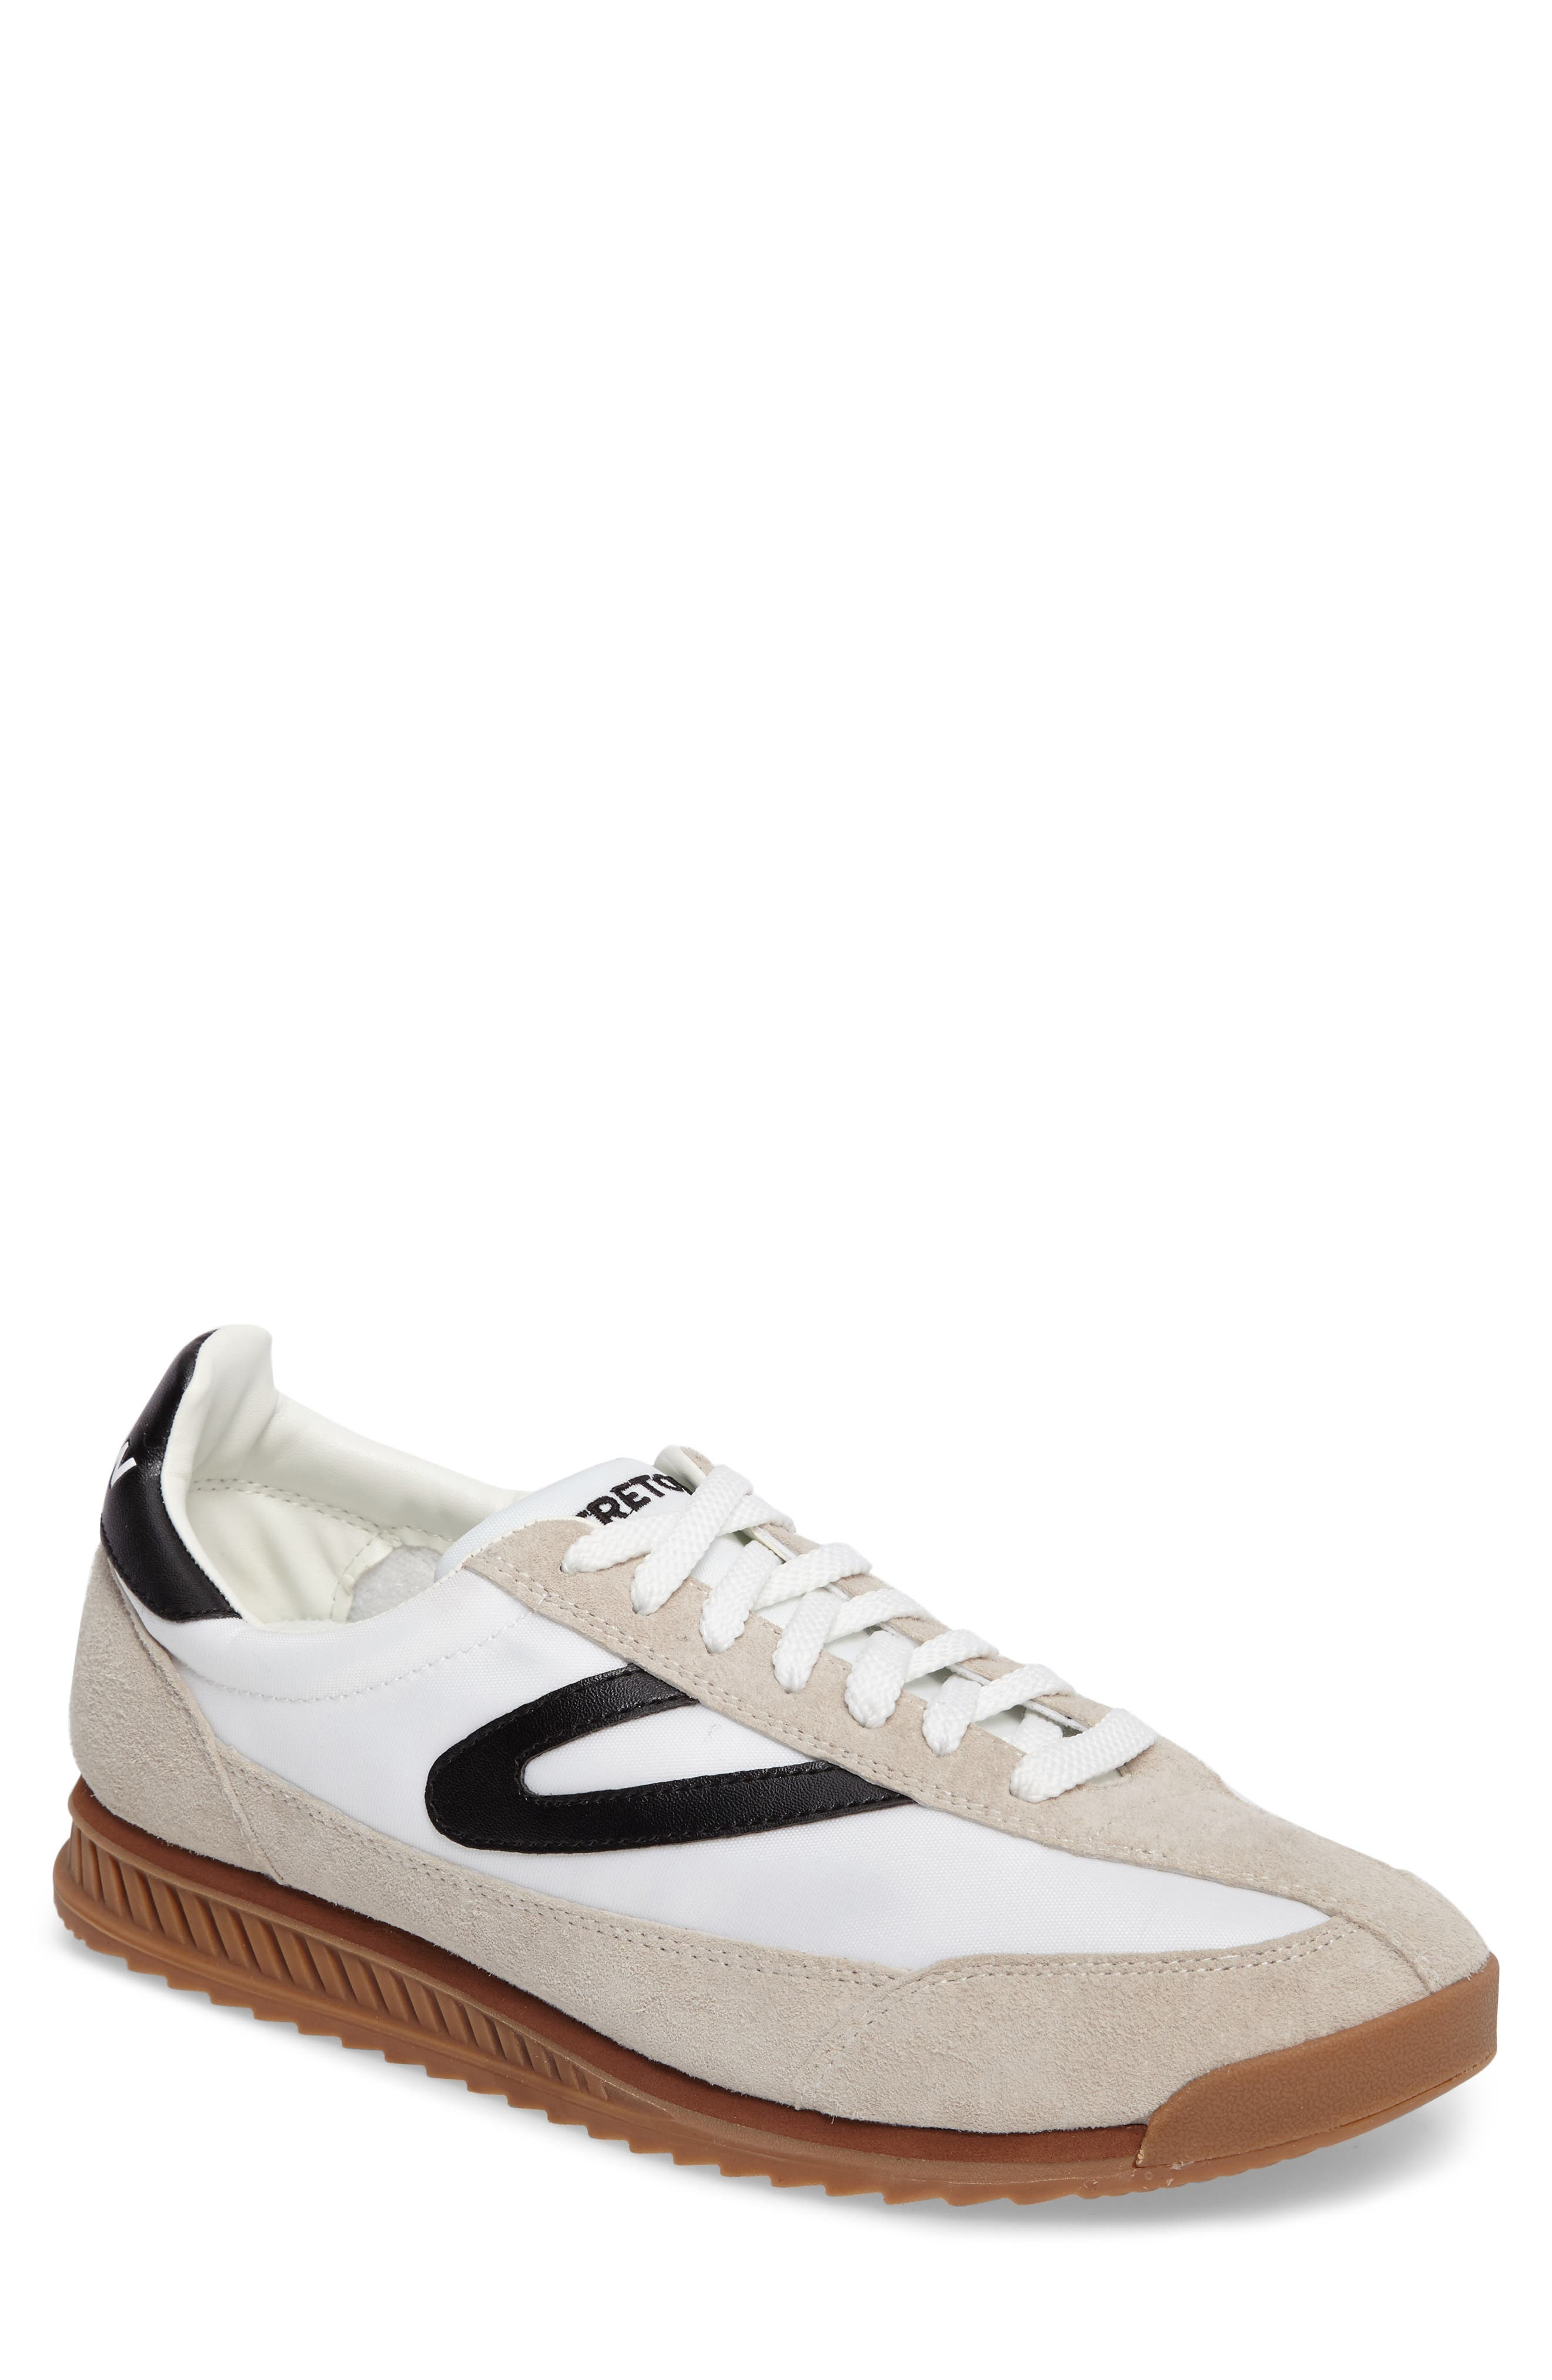 Rawlins 3 Sneaker,                         Main,                         color, 100